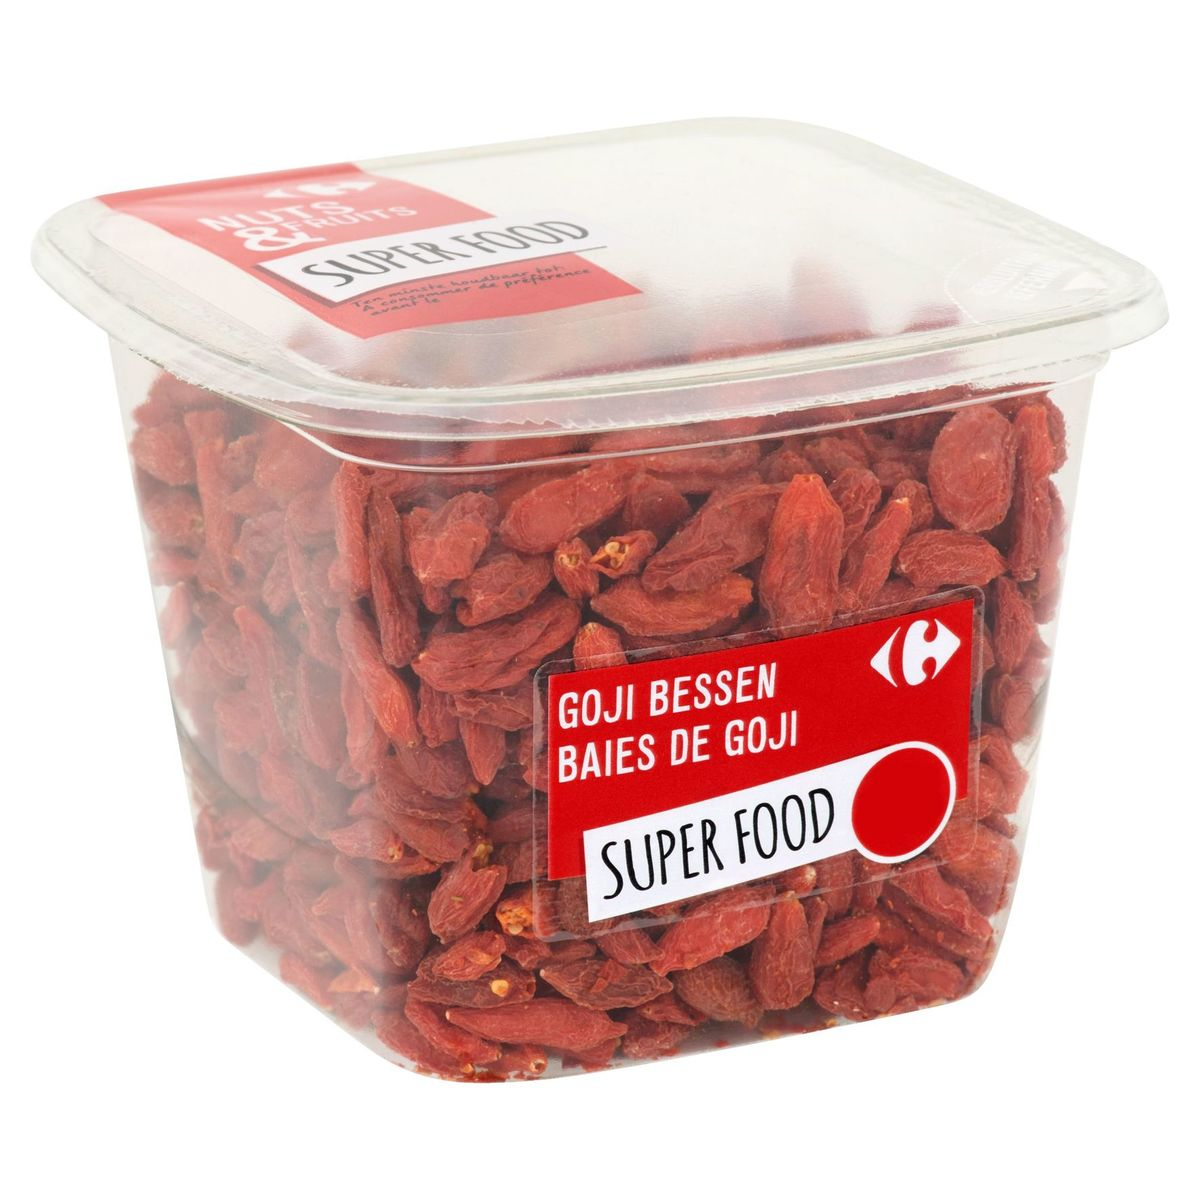 Carrefour Nuts & Fruits Super Food Baies de Goji 160 g